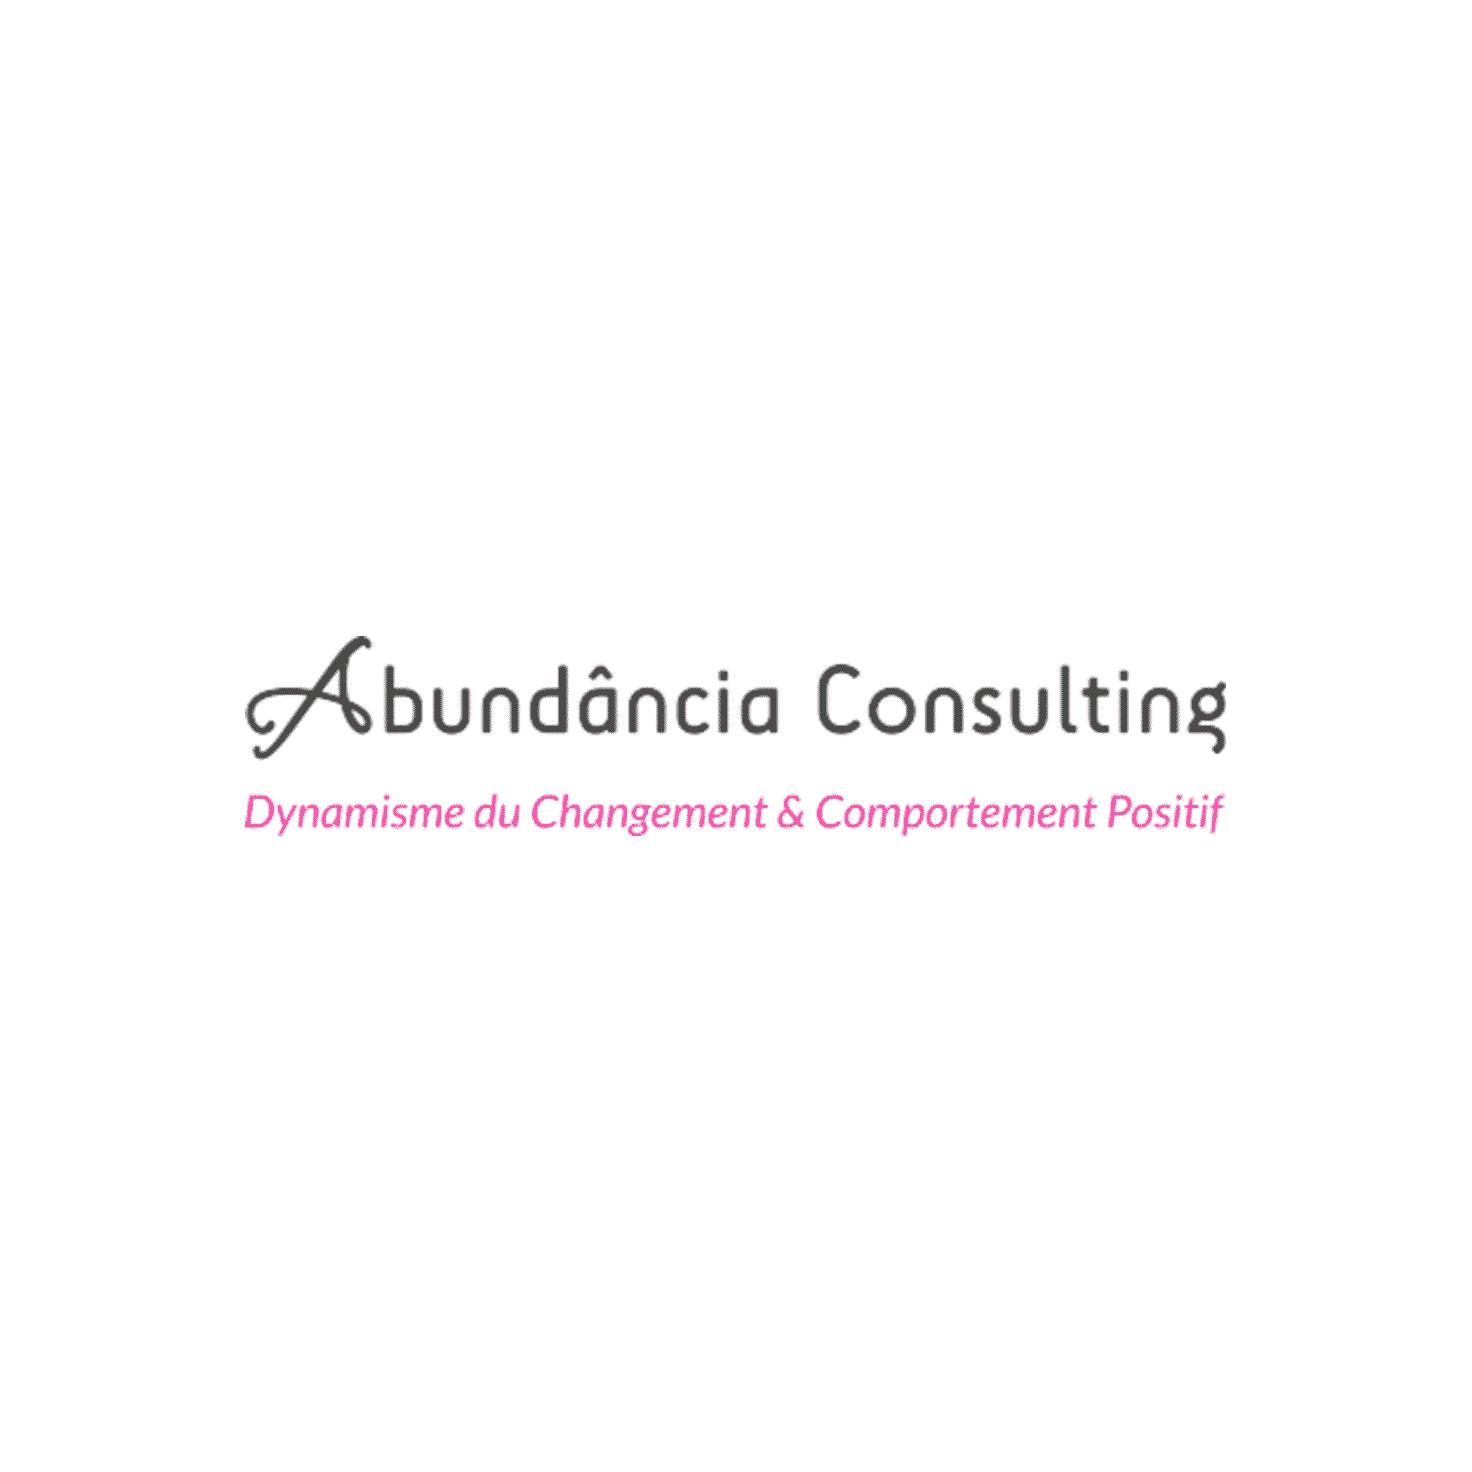 Abundância Consulting